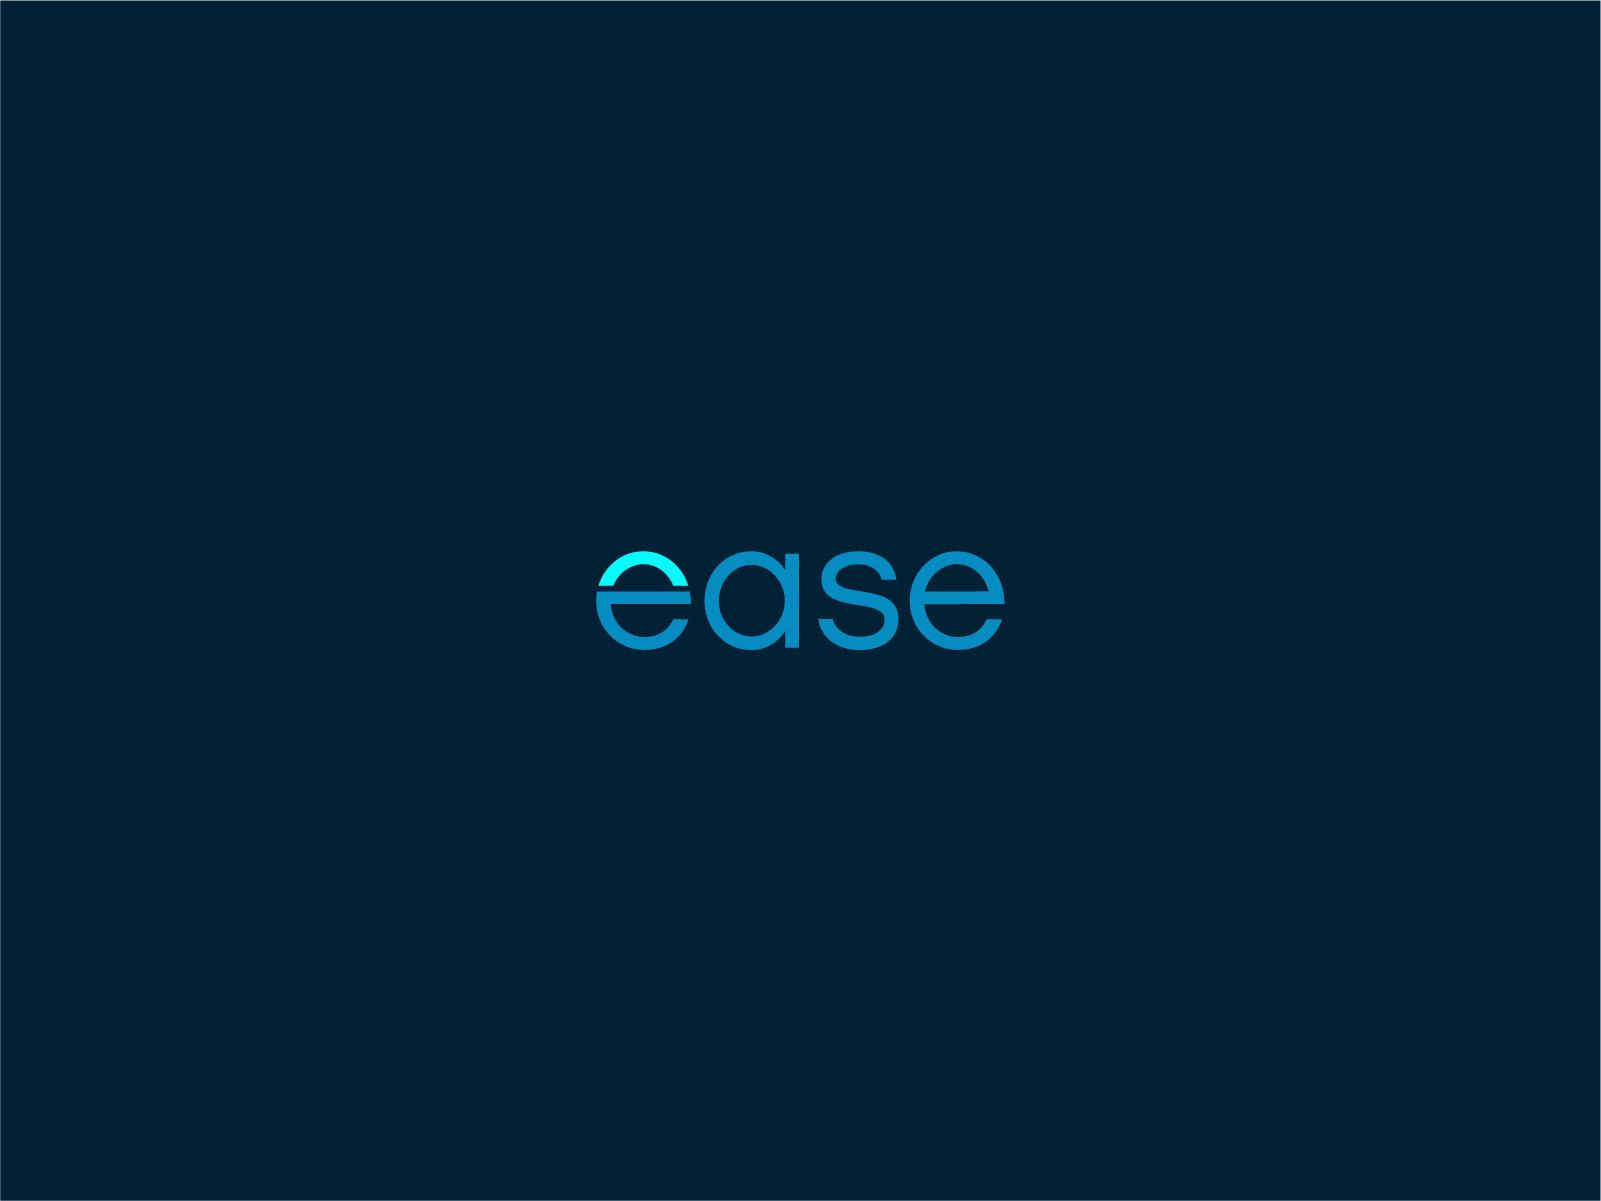 ease@2x-100.jpg